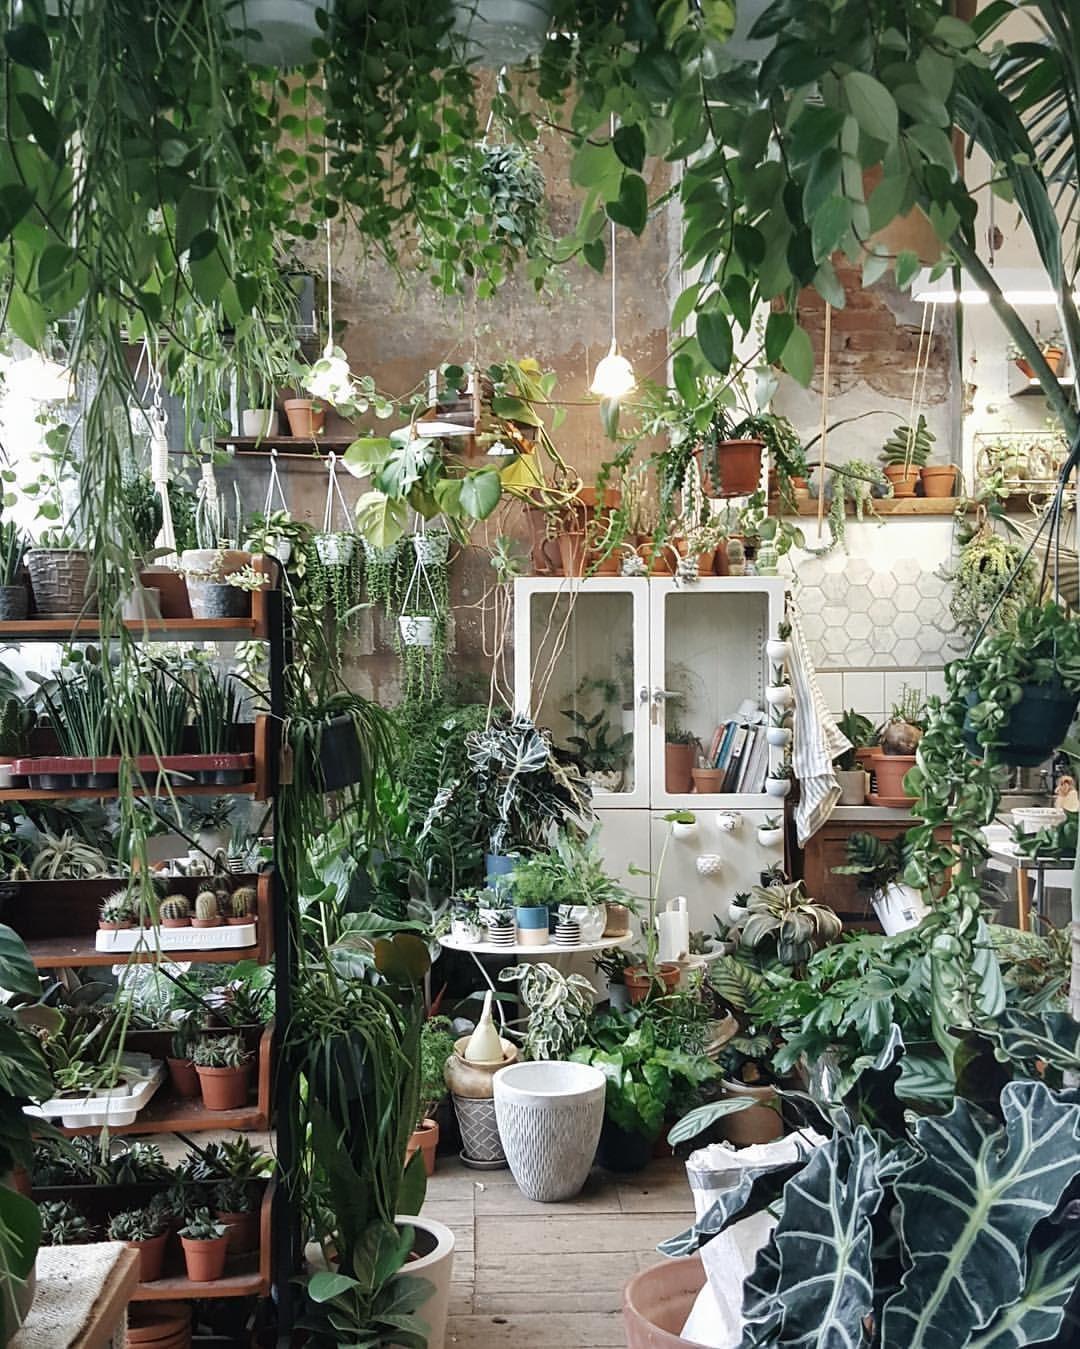 Nursery Indoor Plants Near Me: I Love It When You Call Me Big Poppy! 😛😘🌿